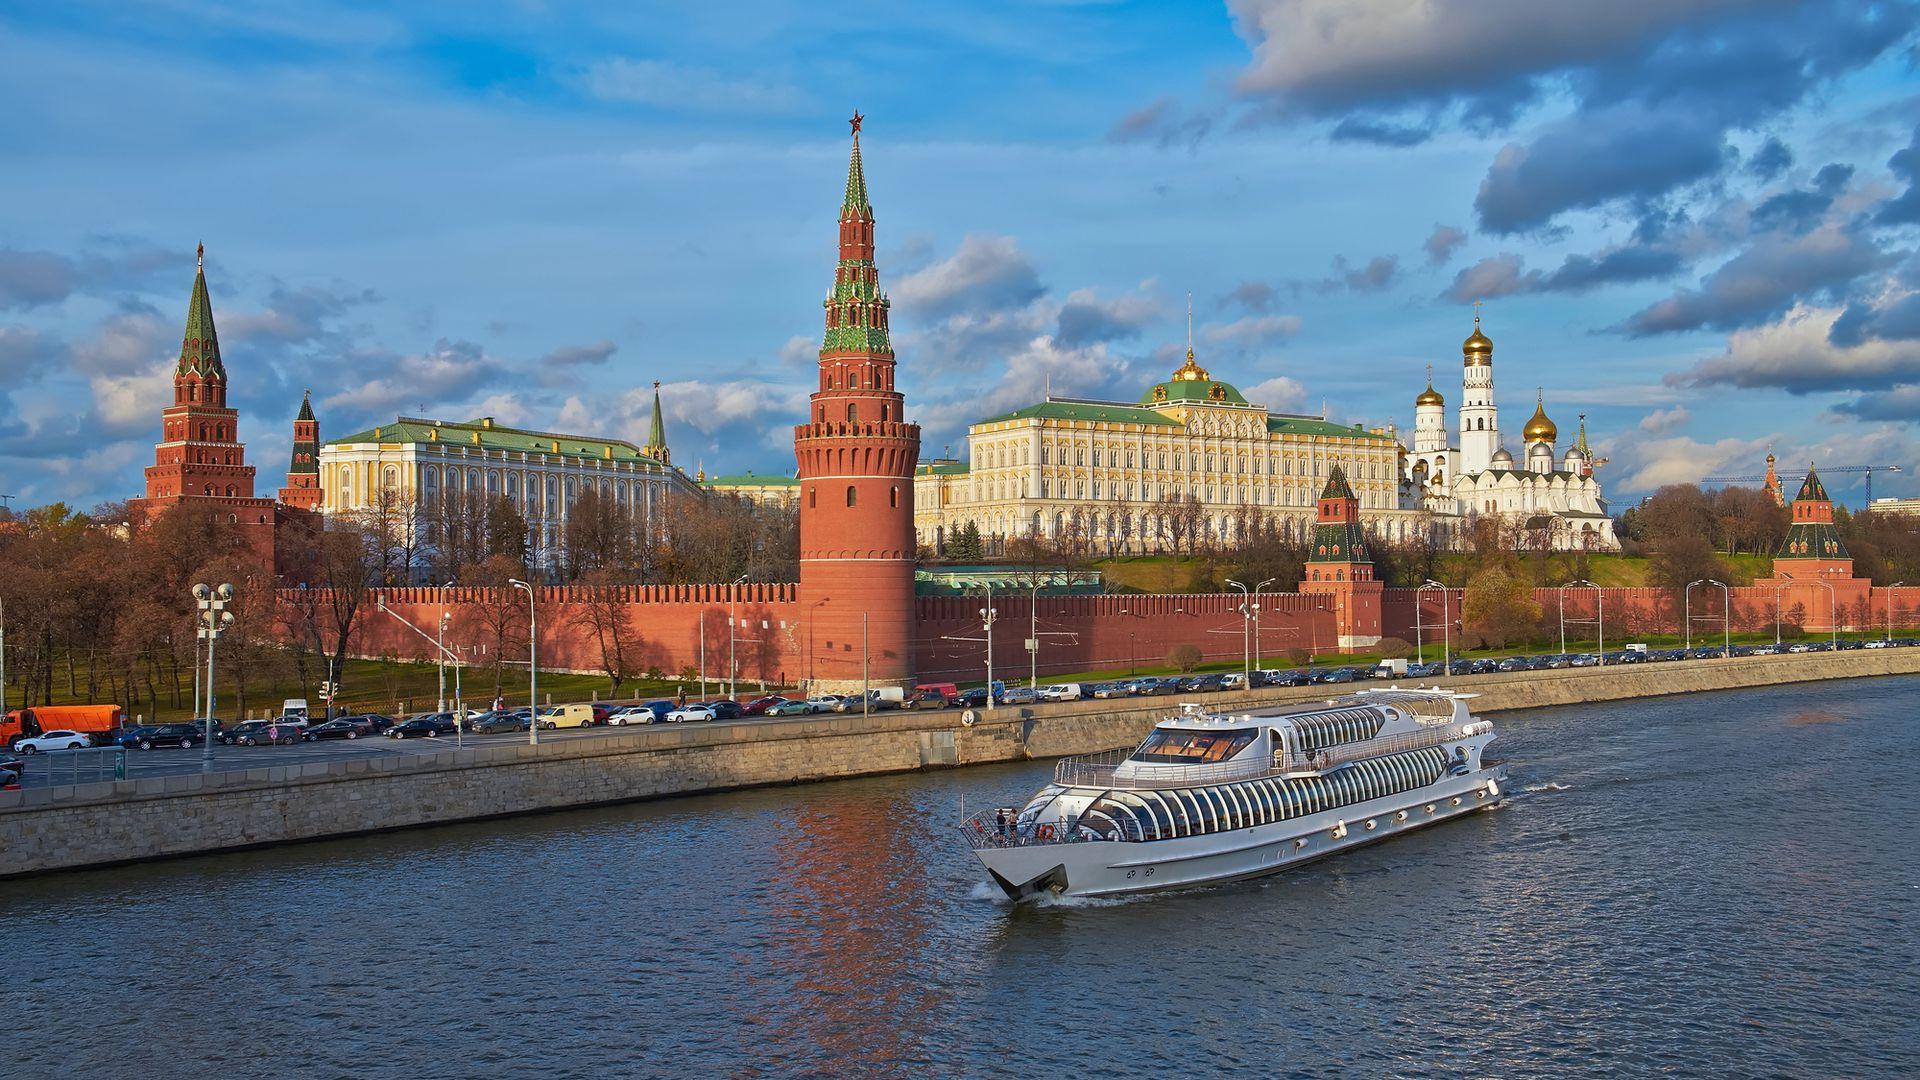 Круиз с аудиогидом по Москве-реке на яхте флотилии «Рэдиссон»